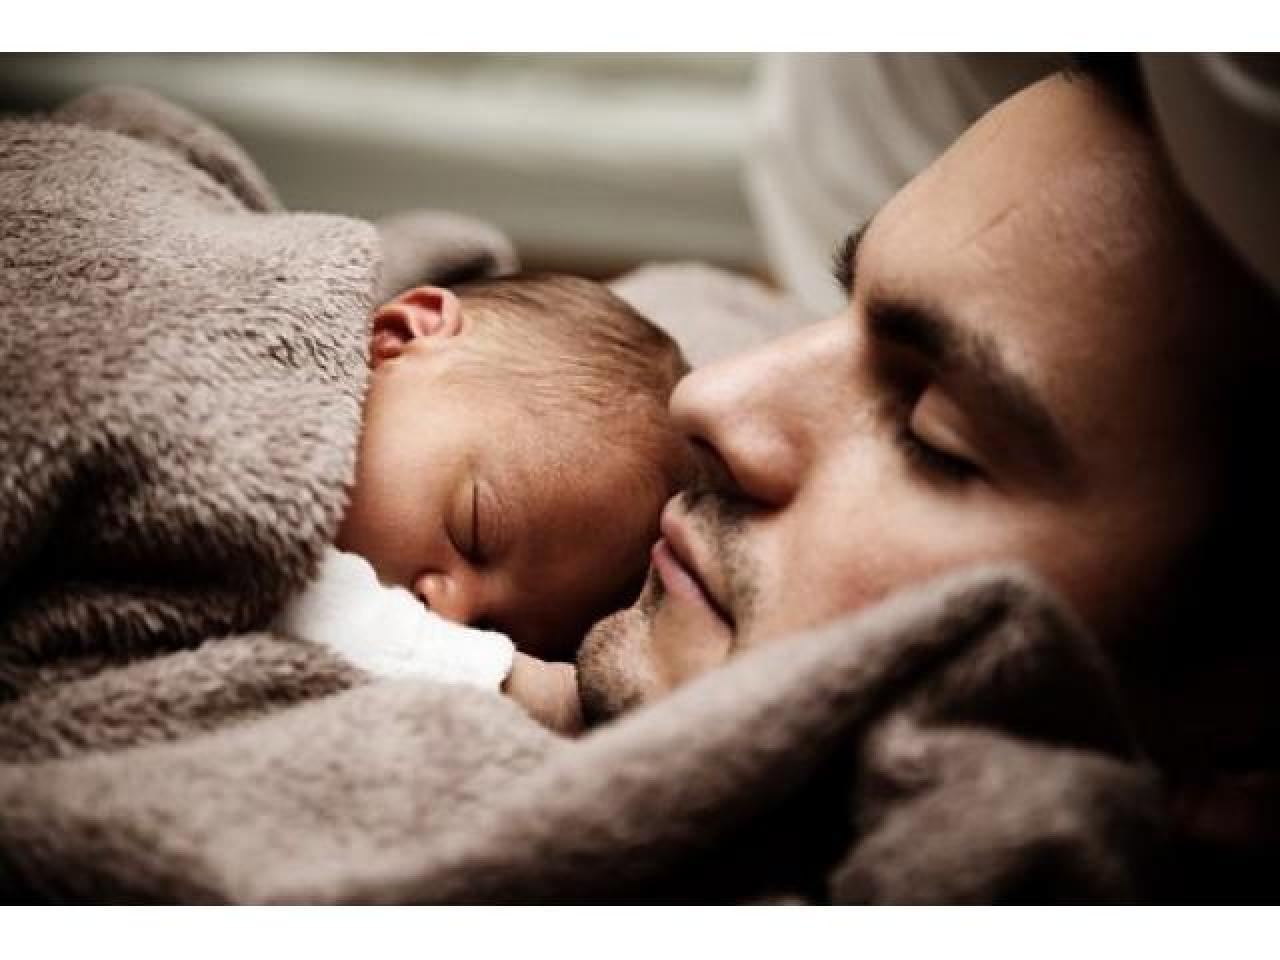 Няня, няня новорожденному - 1